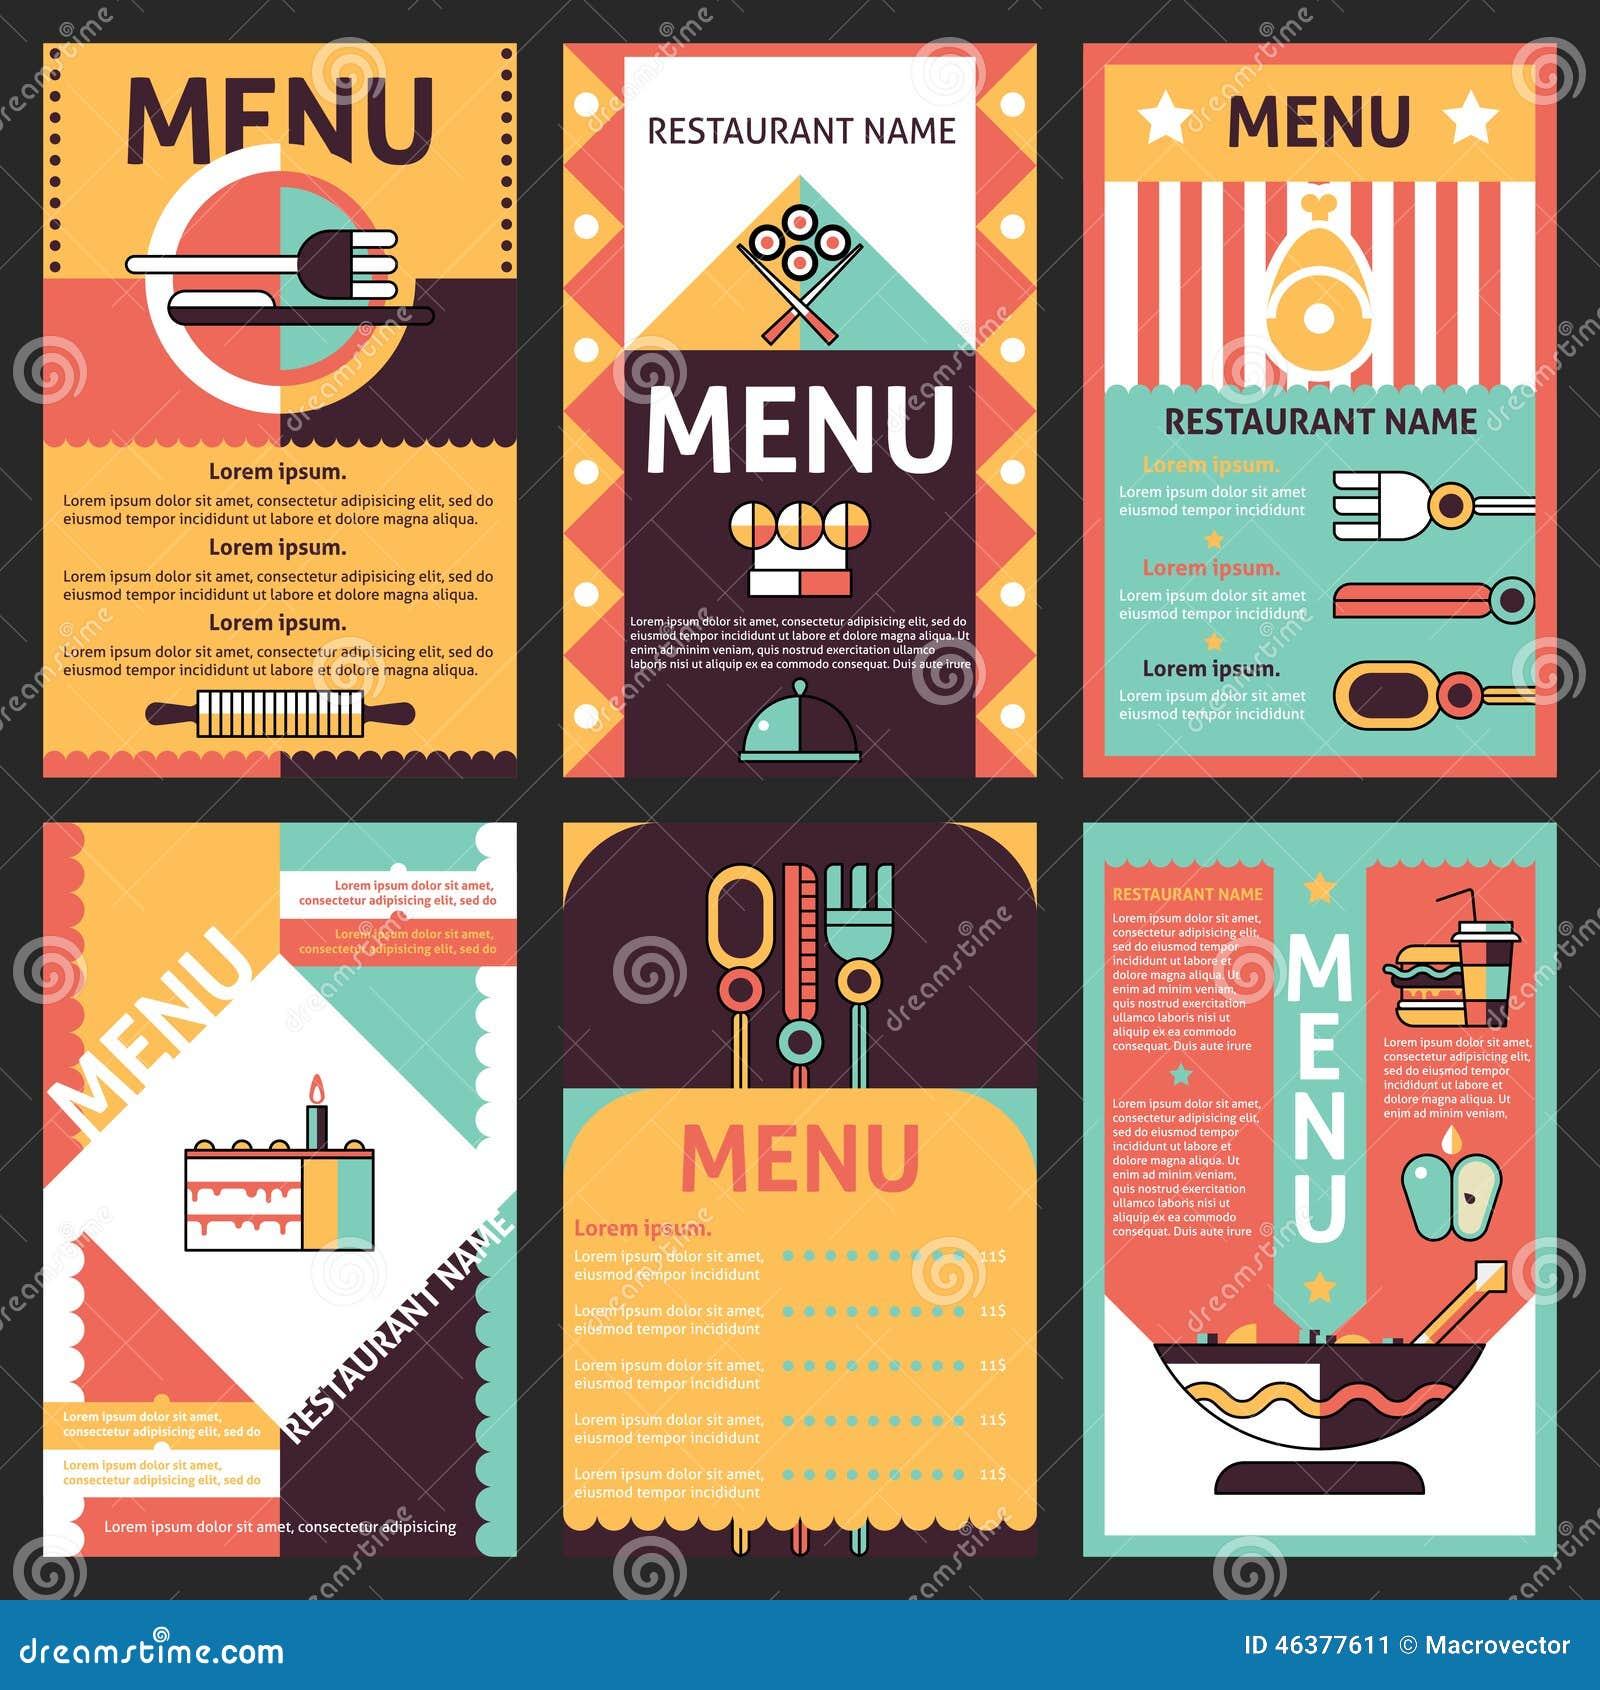 Restaurant Menu Designs Stock Vector Image 46377611